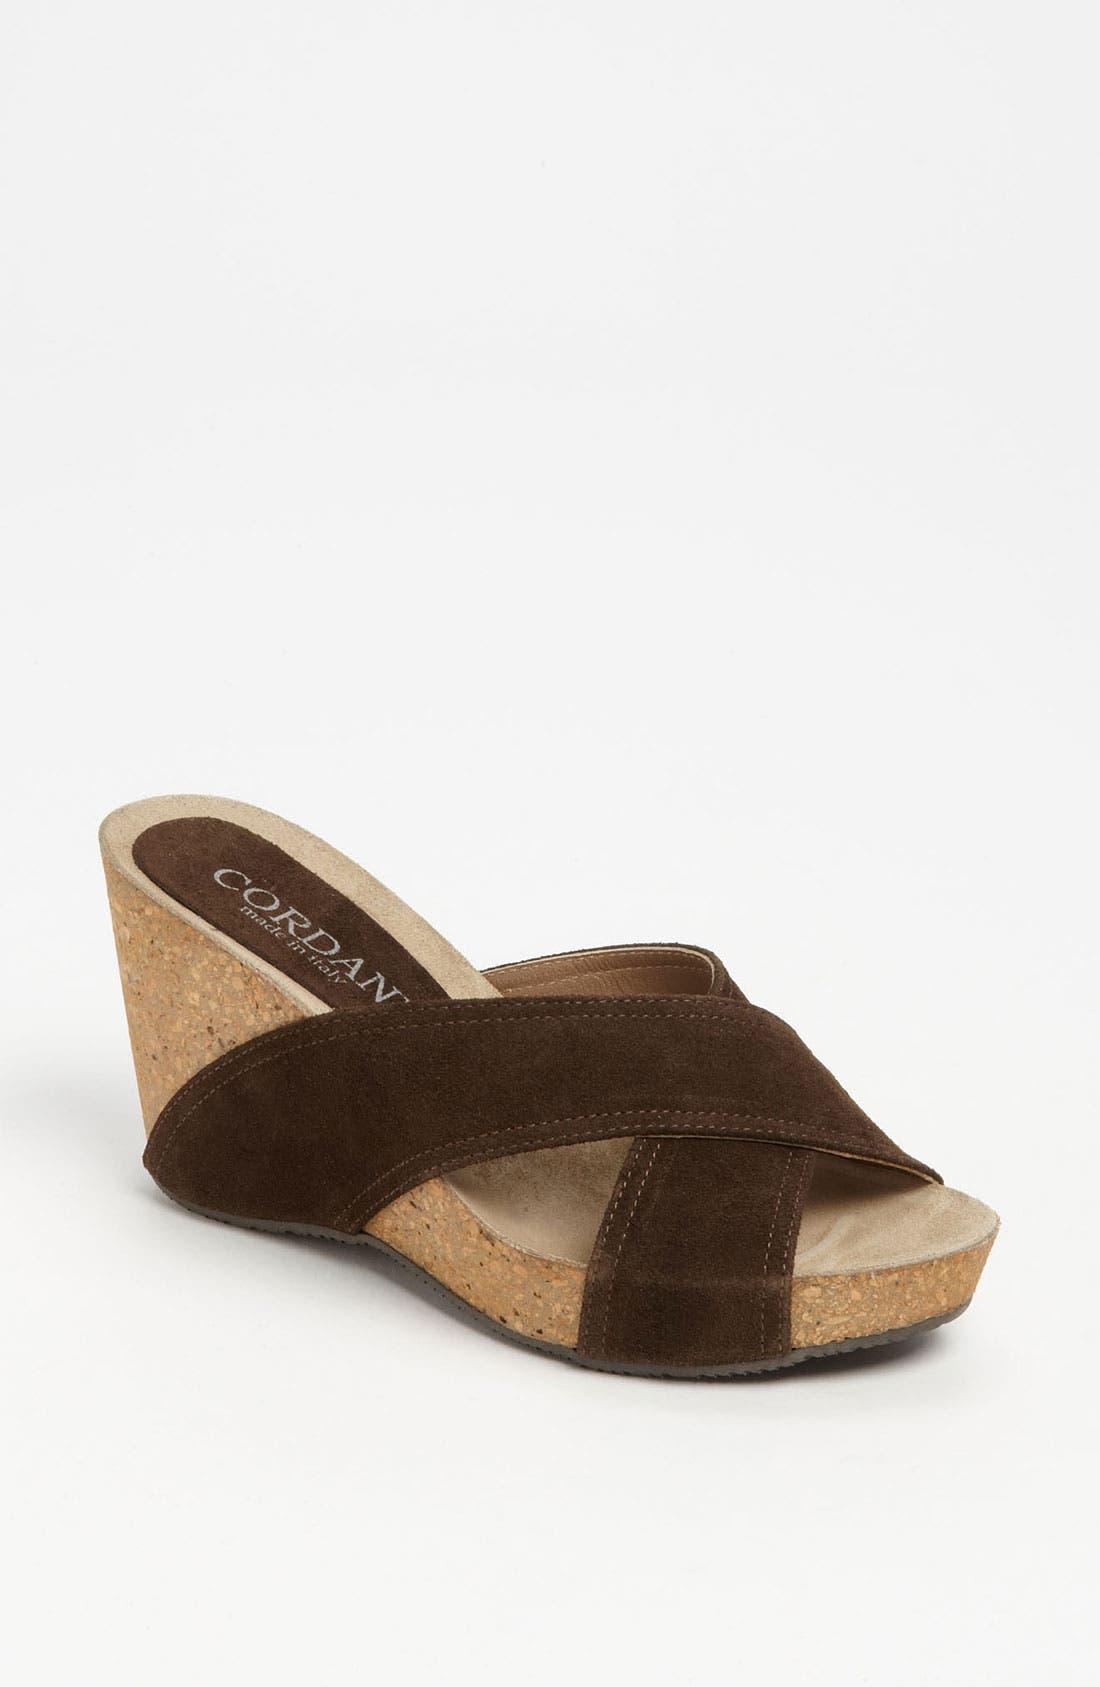 Main Image - Cordani 'Adriana' Sandal